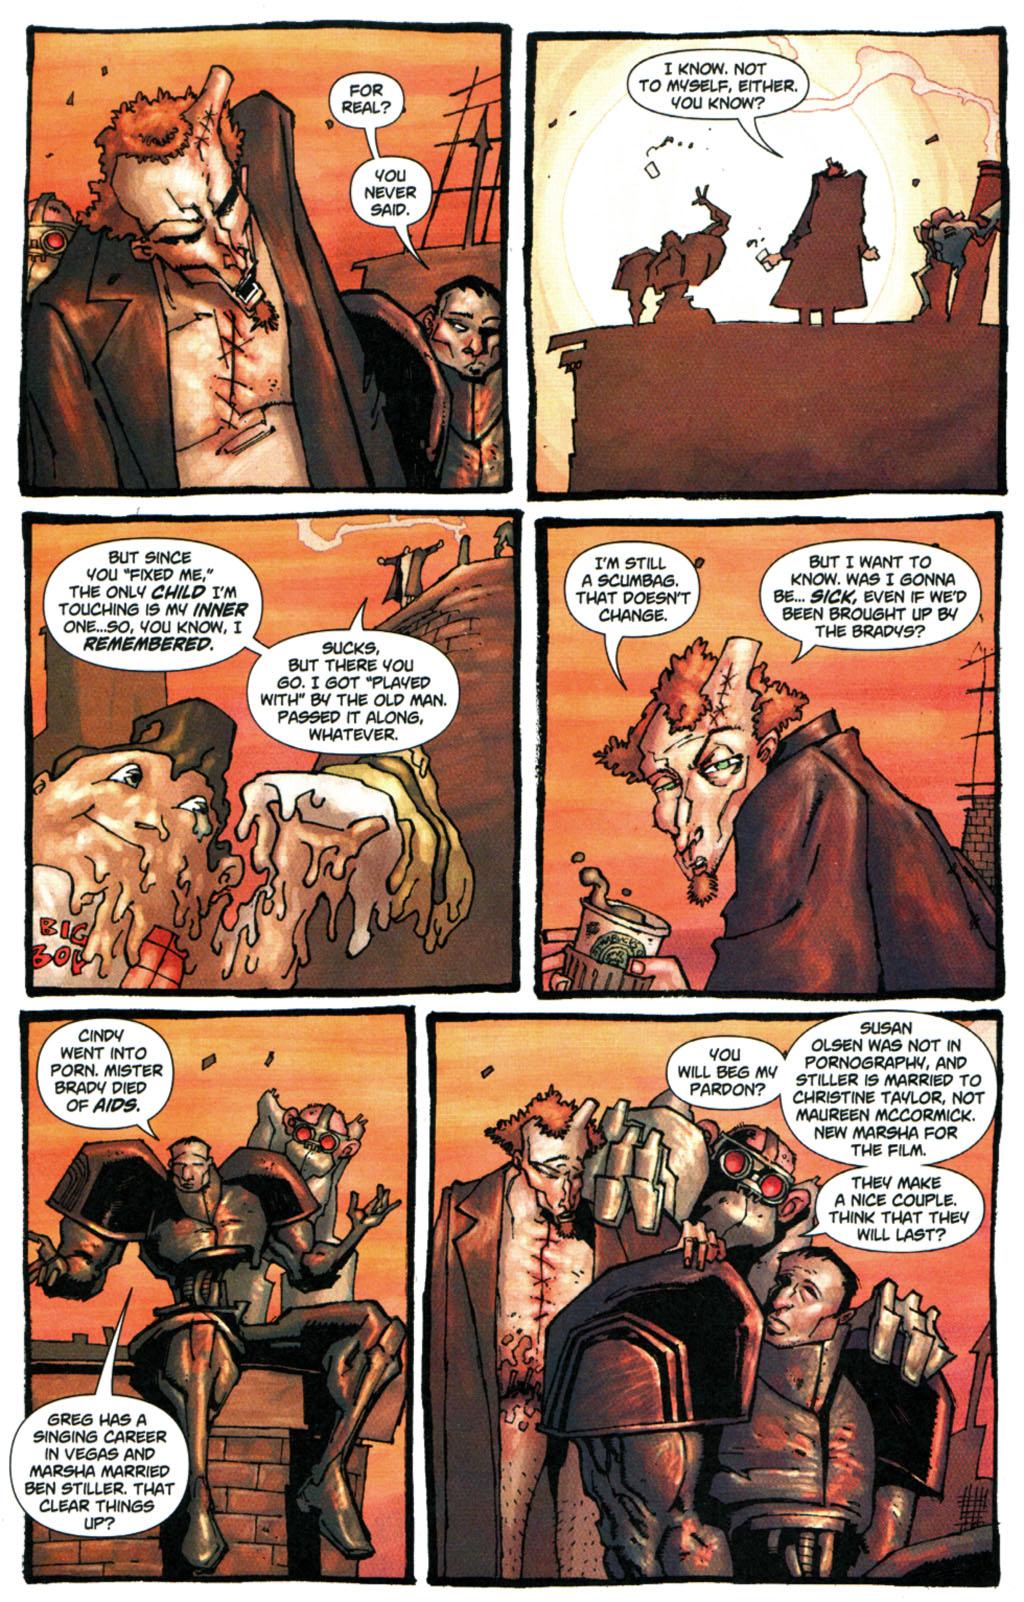 Read online Enginehead comic -  Issue #5 - 10